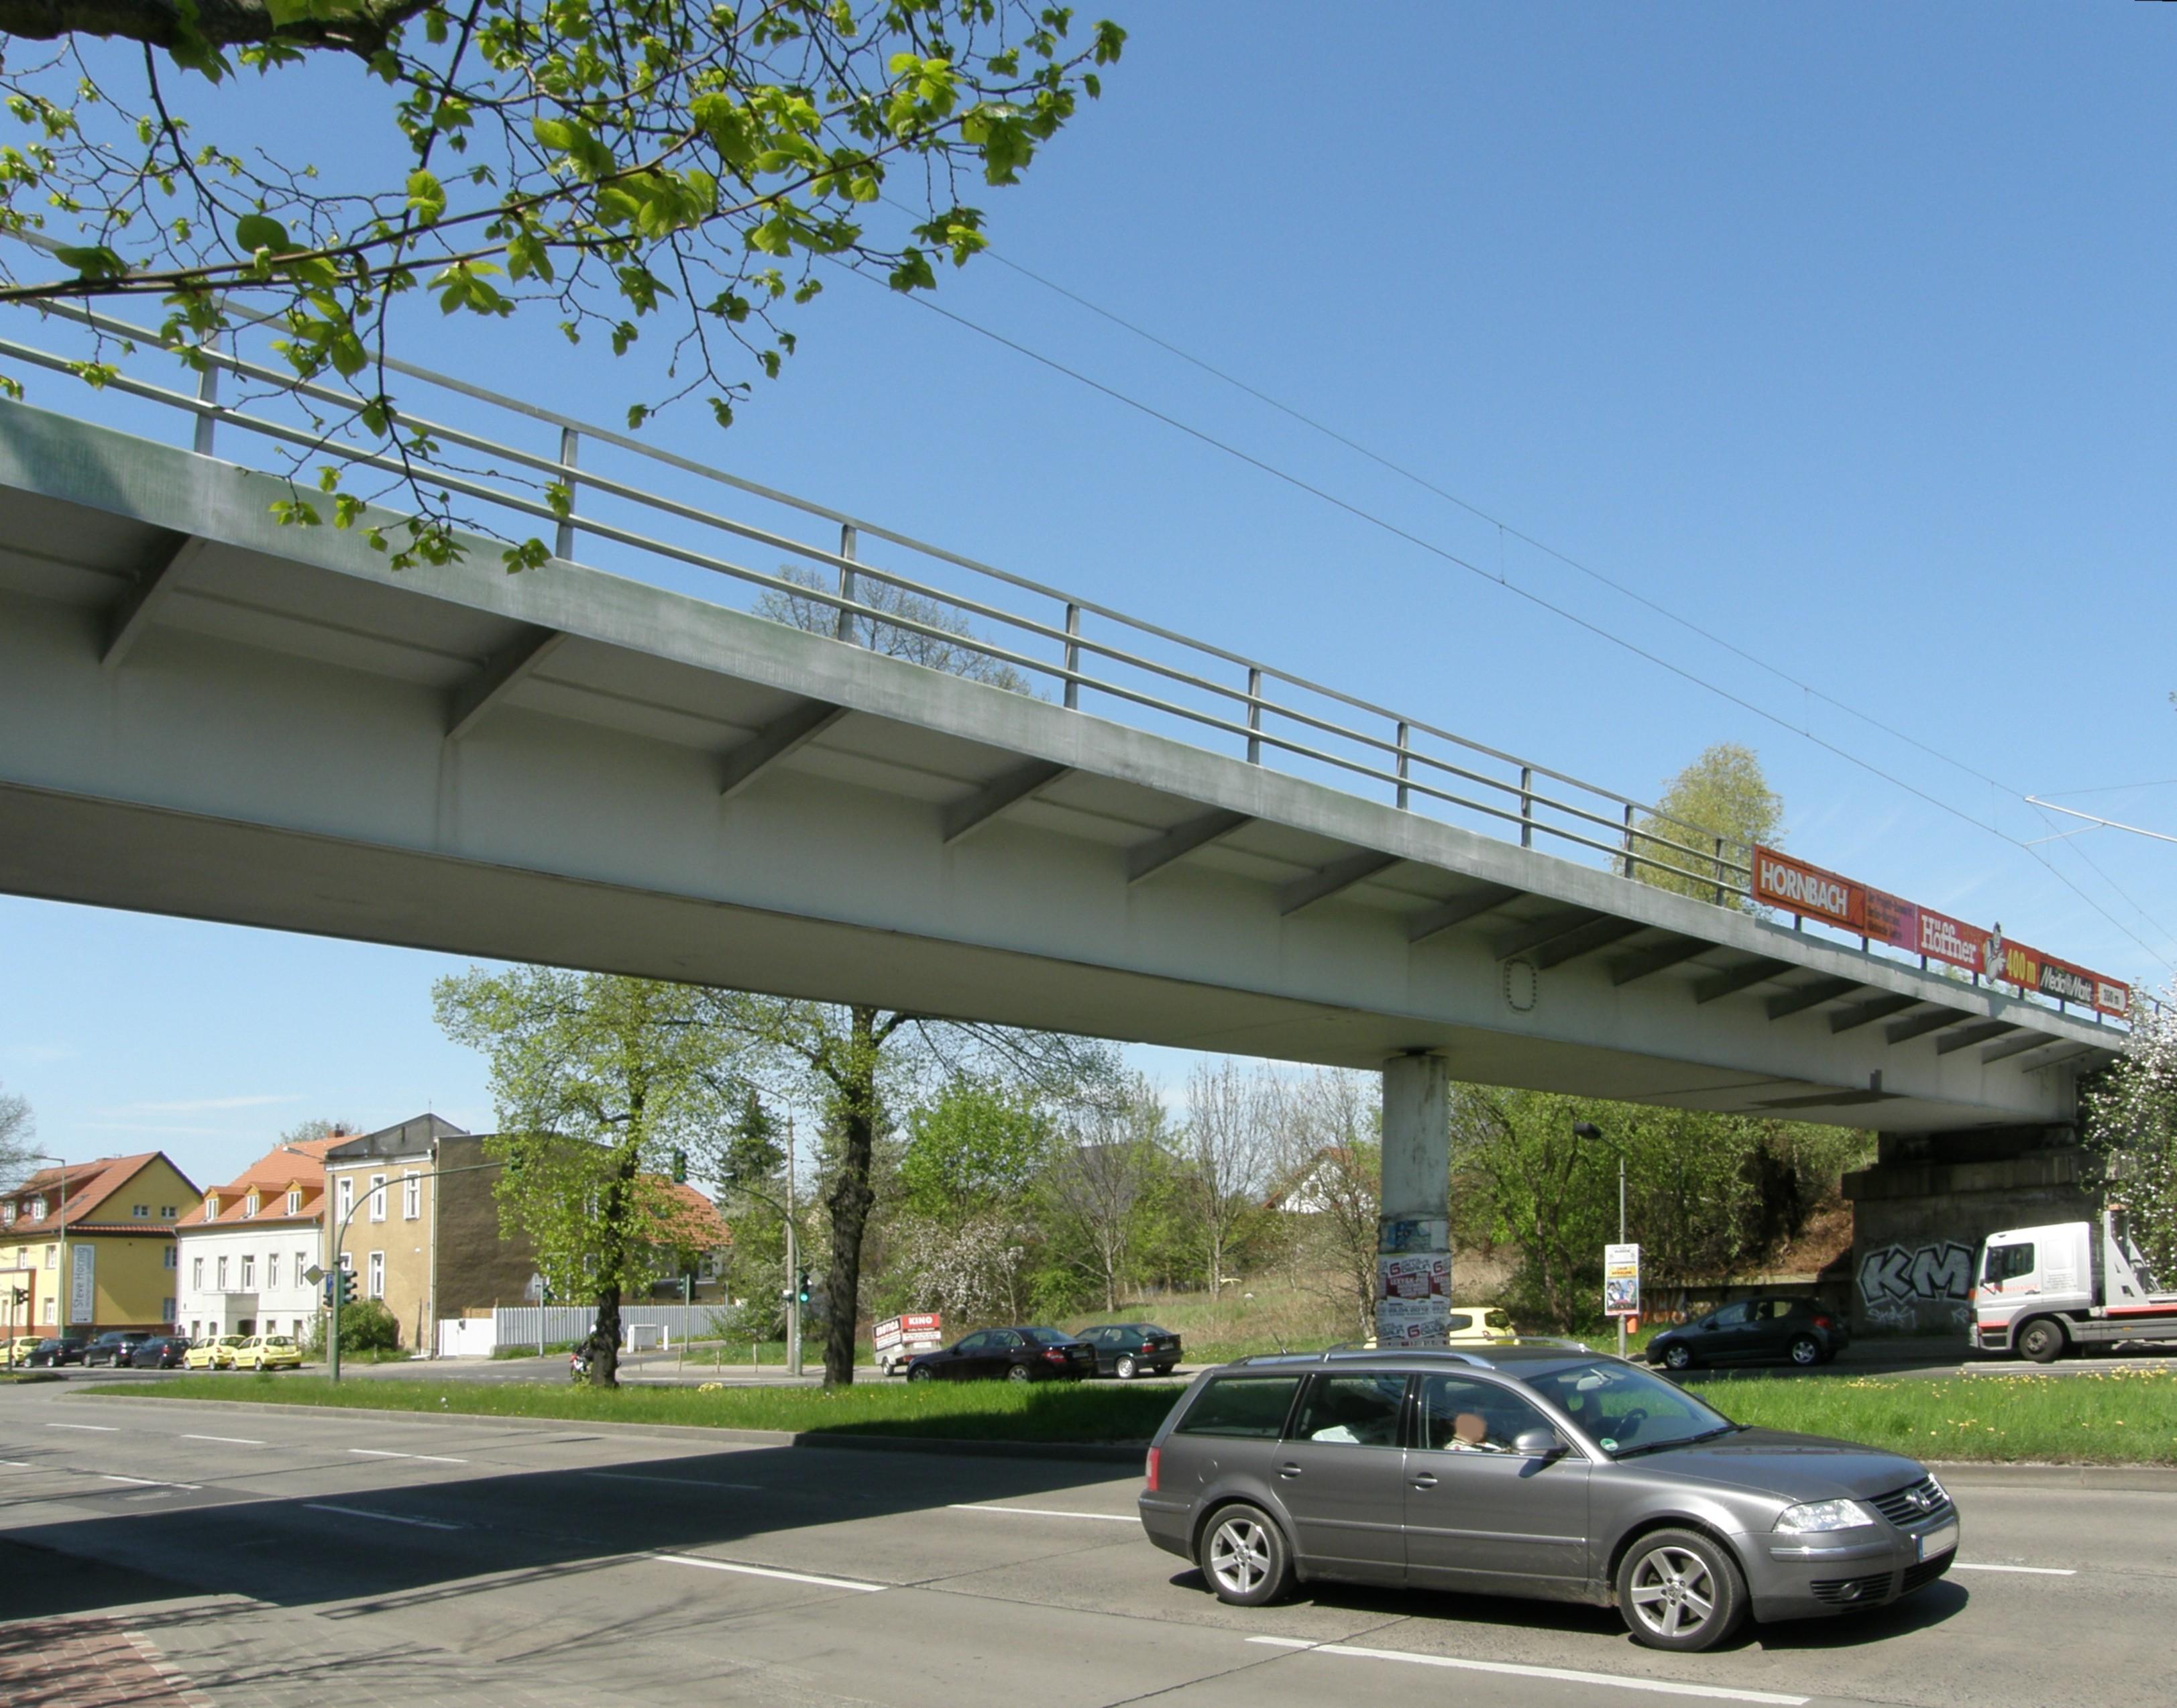 Datei:Alt-Biesdorf Eisenbahnbrücke 2012-4-27 ama fec.jpg – Wikipedia